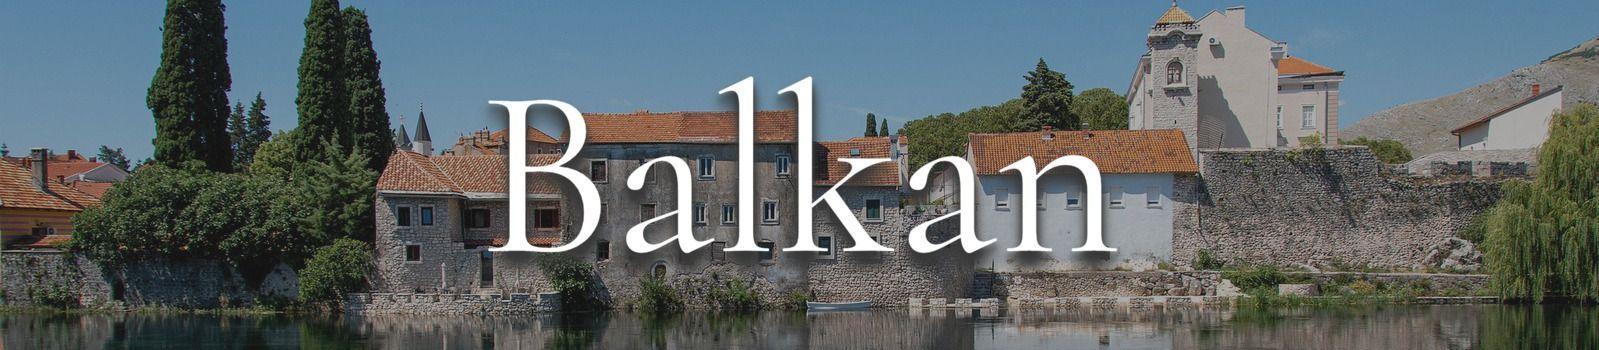 Balkan Banner